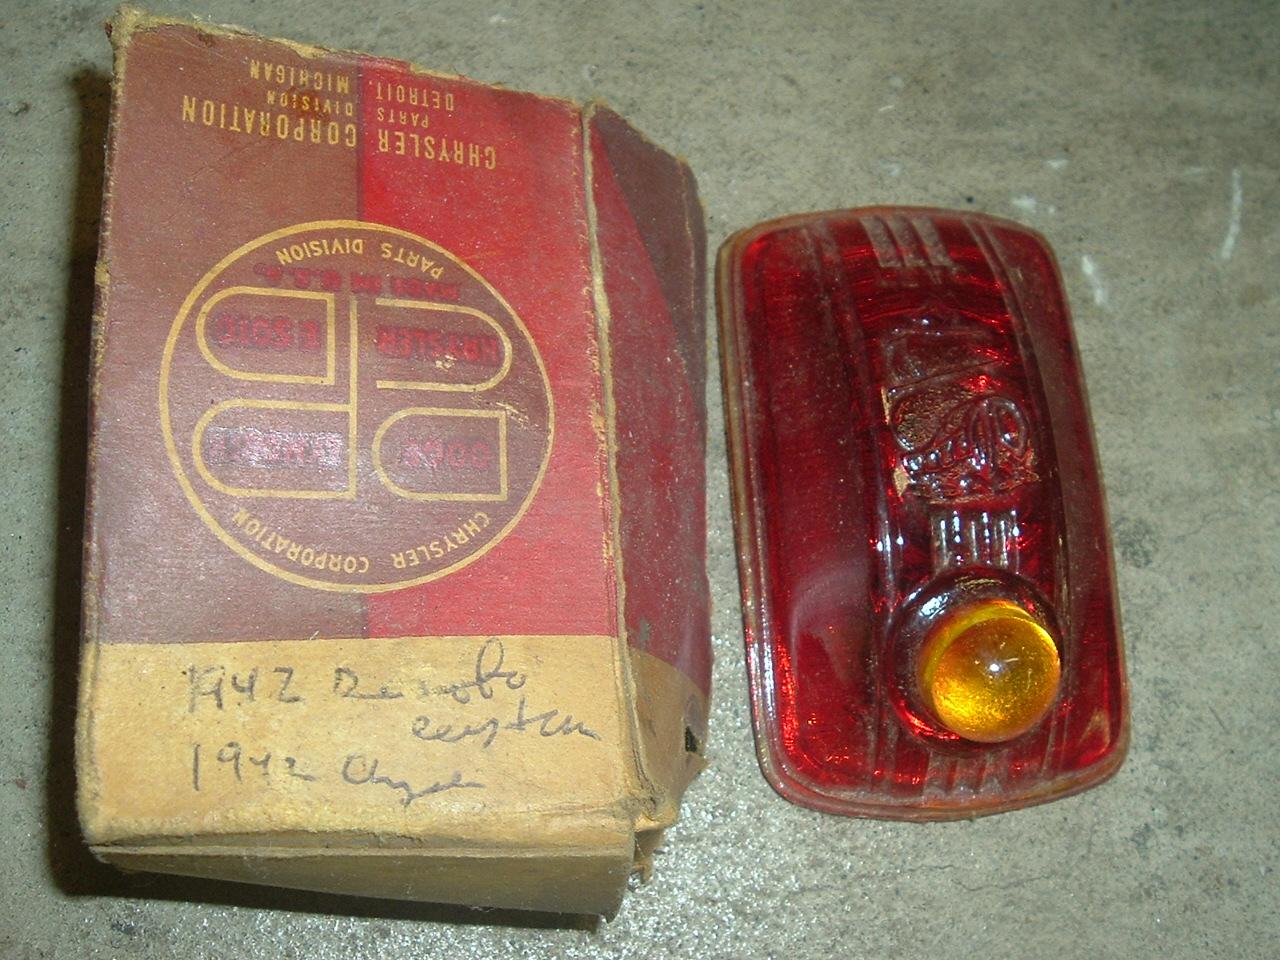 1942 -48 Desoto Chrysler lisc lamp lens 974935 (a 974935)